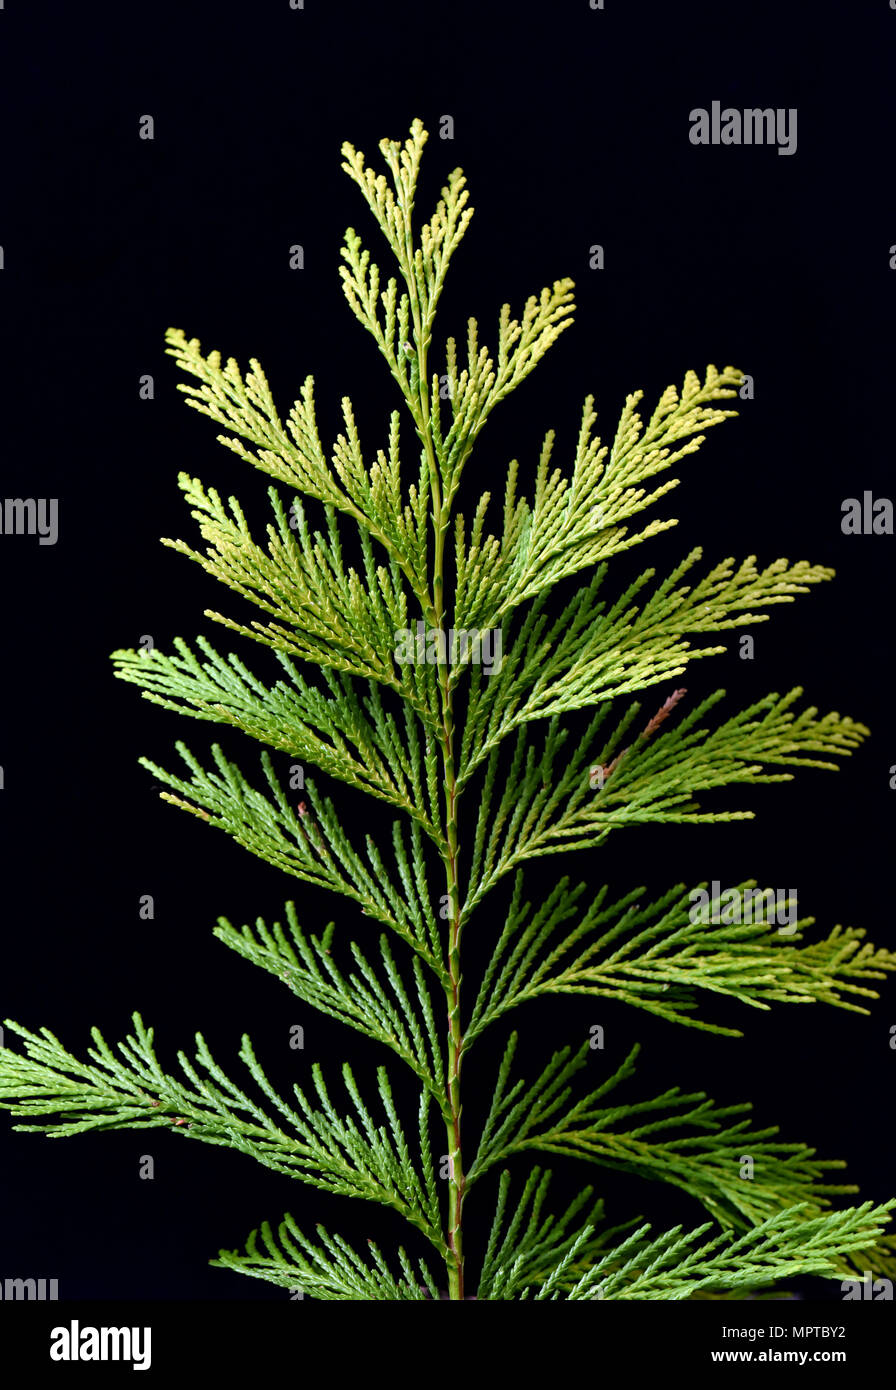 Lebensbaum, Thuja, occidentalis, Giftpflanze, Heilpflanze - Stock Image